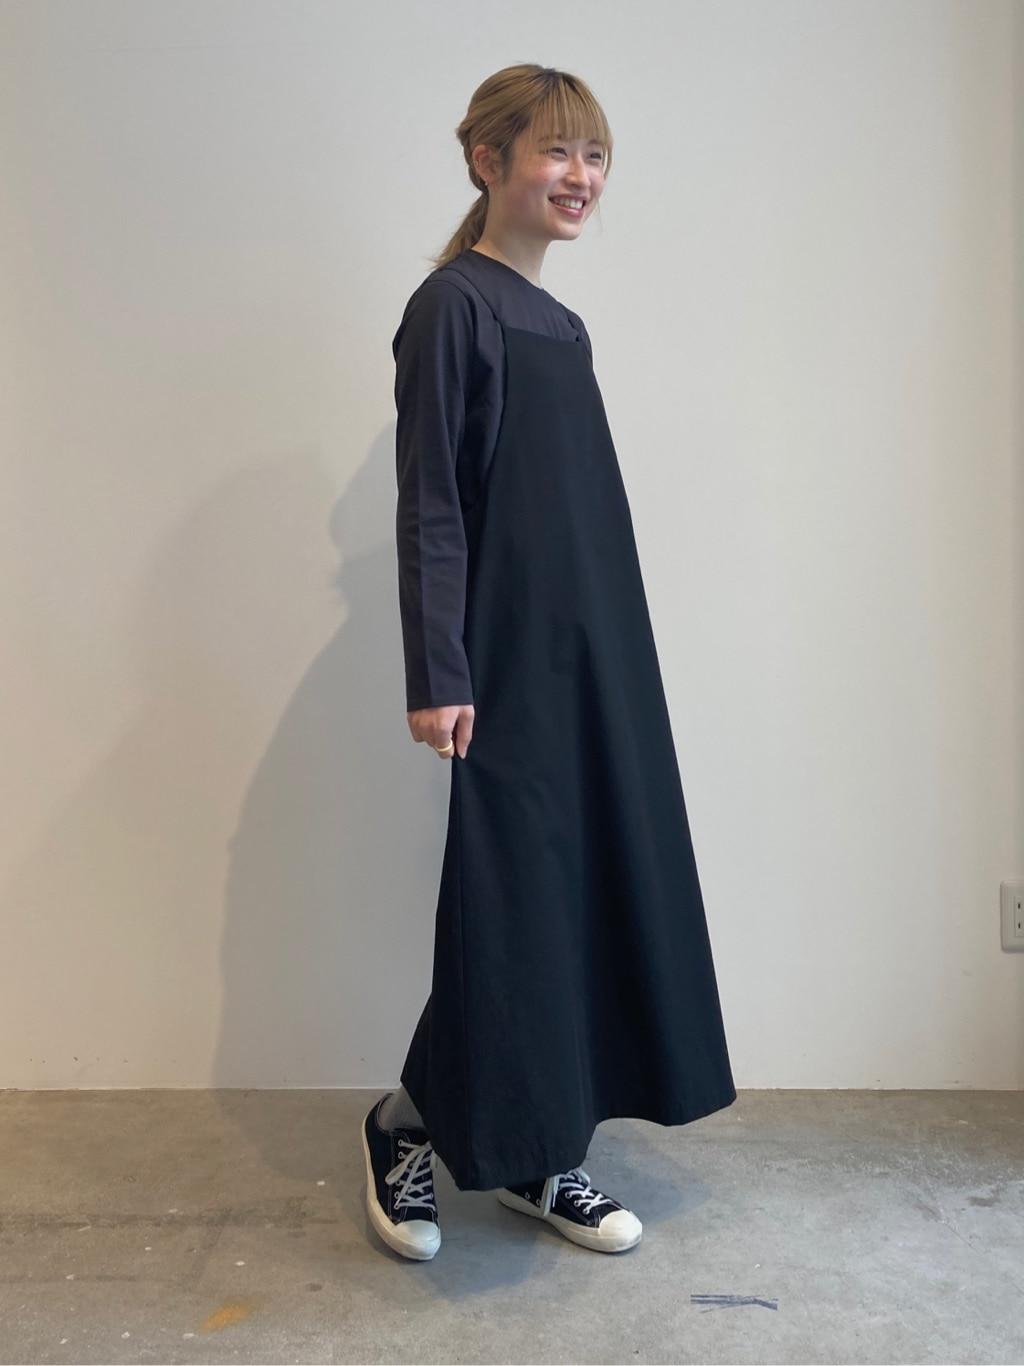 FLAT AMB 名古屋栄路面 2021.02.20